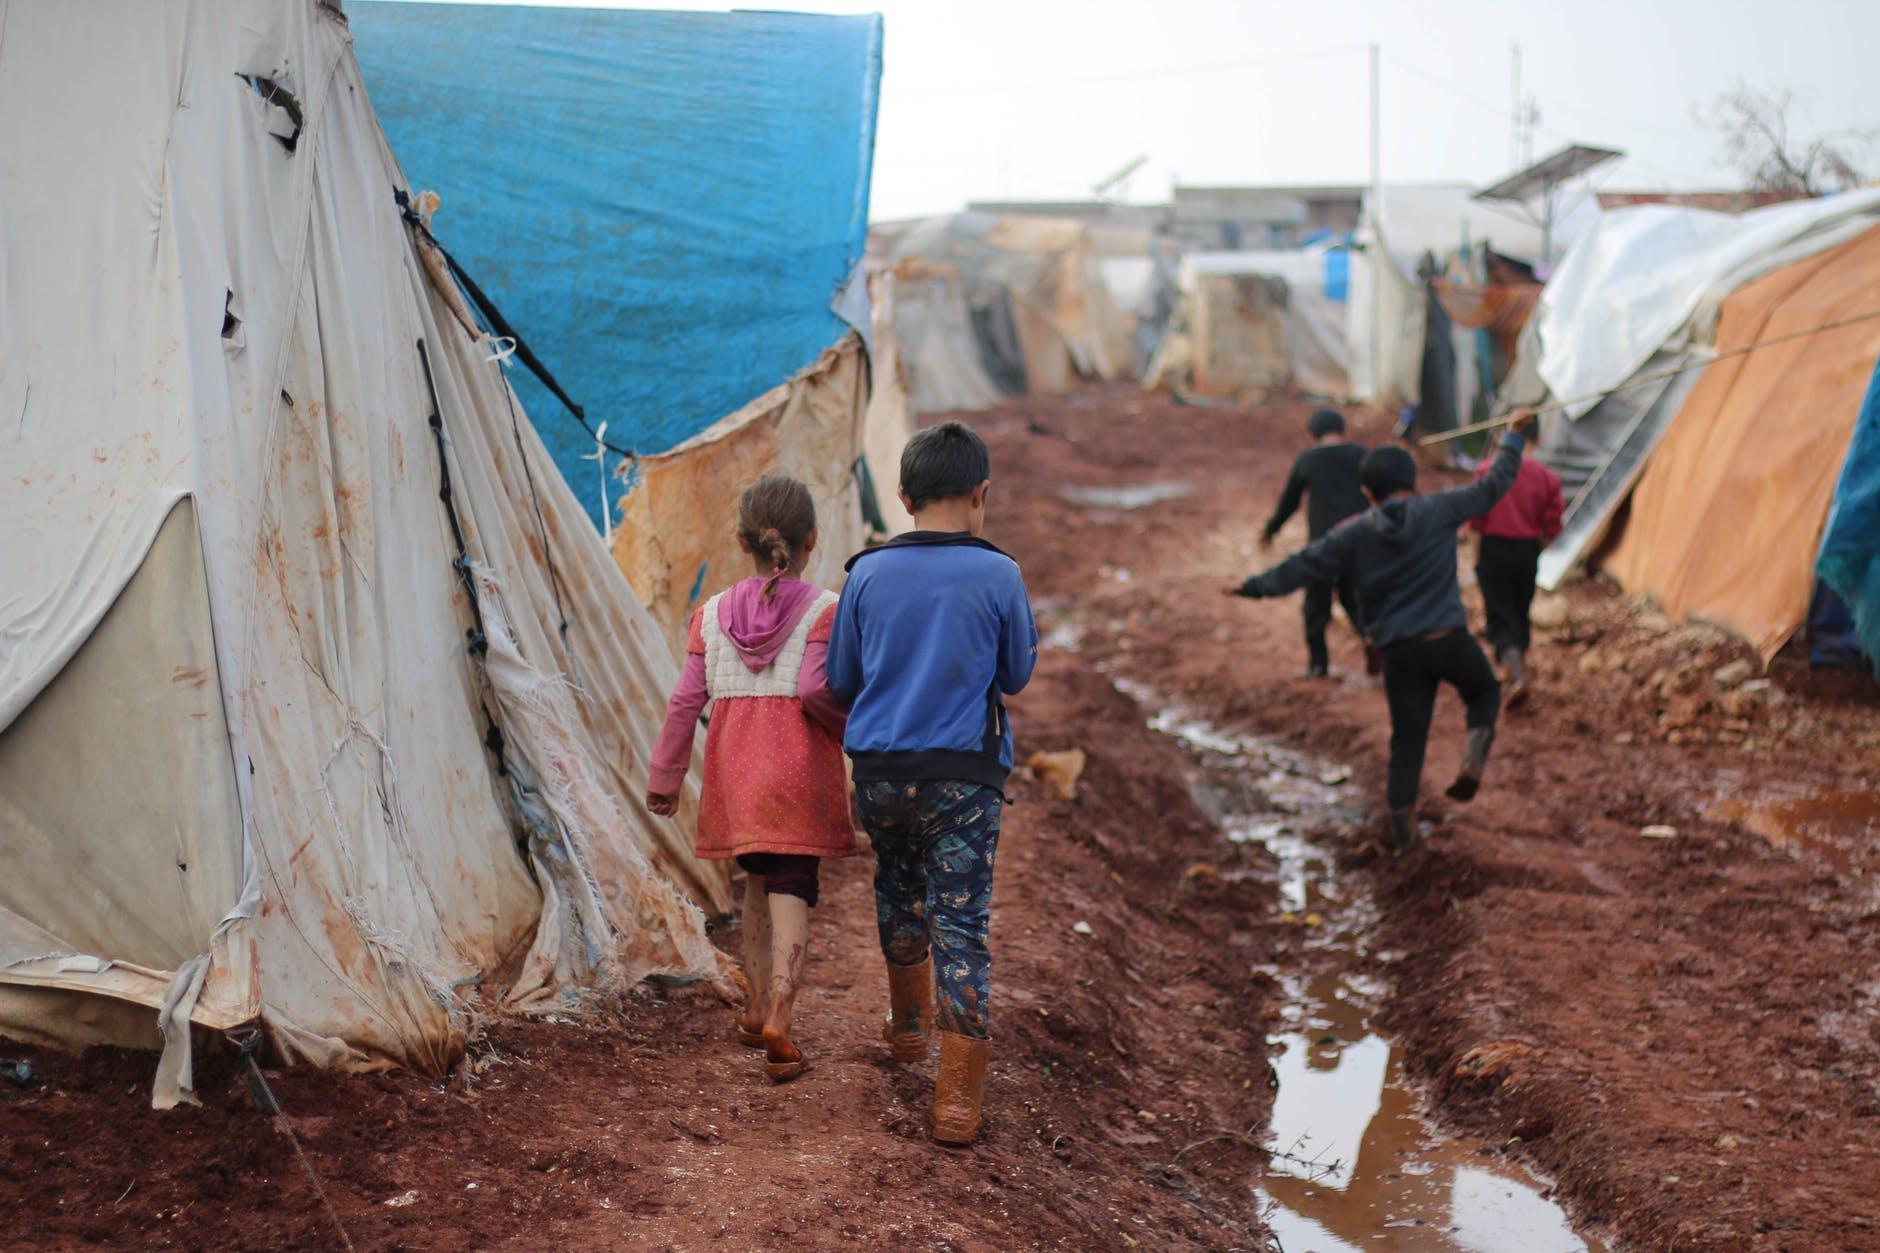 https://lisaslaw.co.uk/wp-content/uploads/2021/08/asylum-seekers-1.jpeg